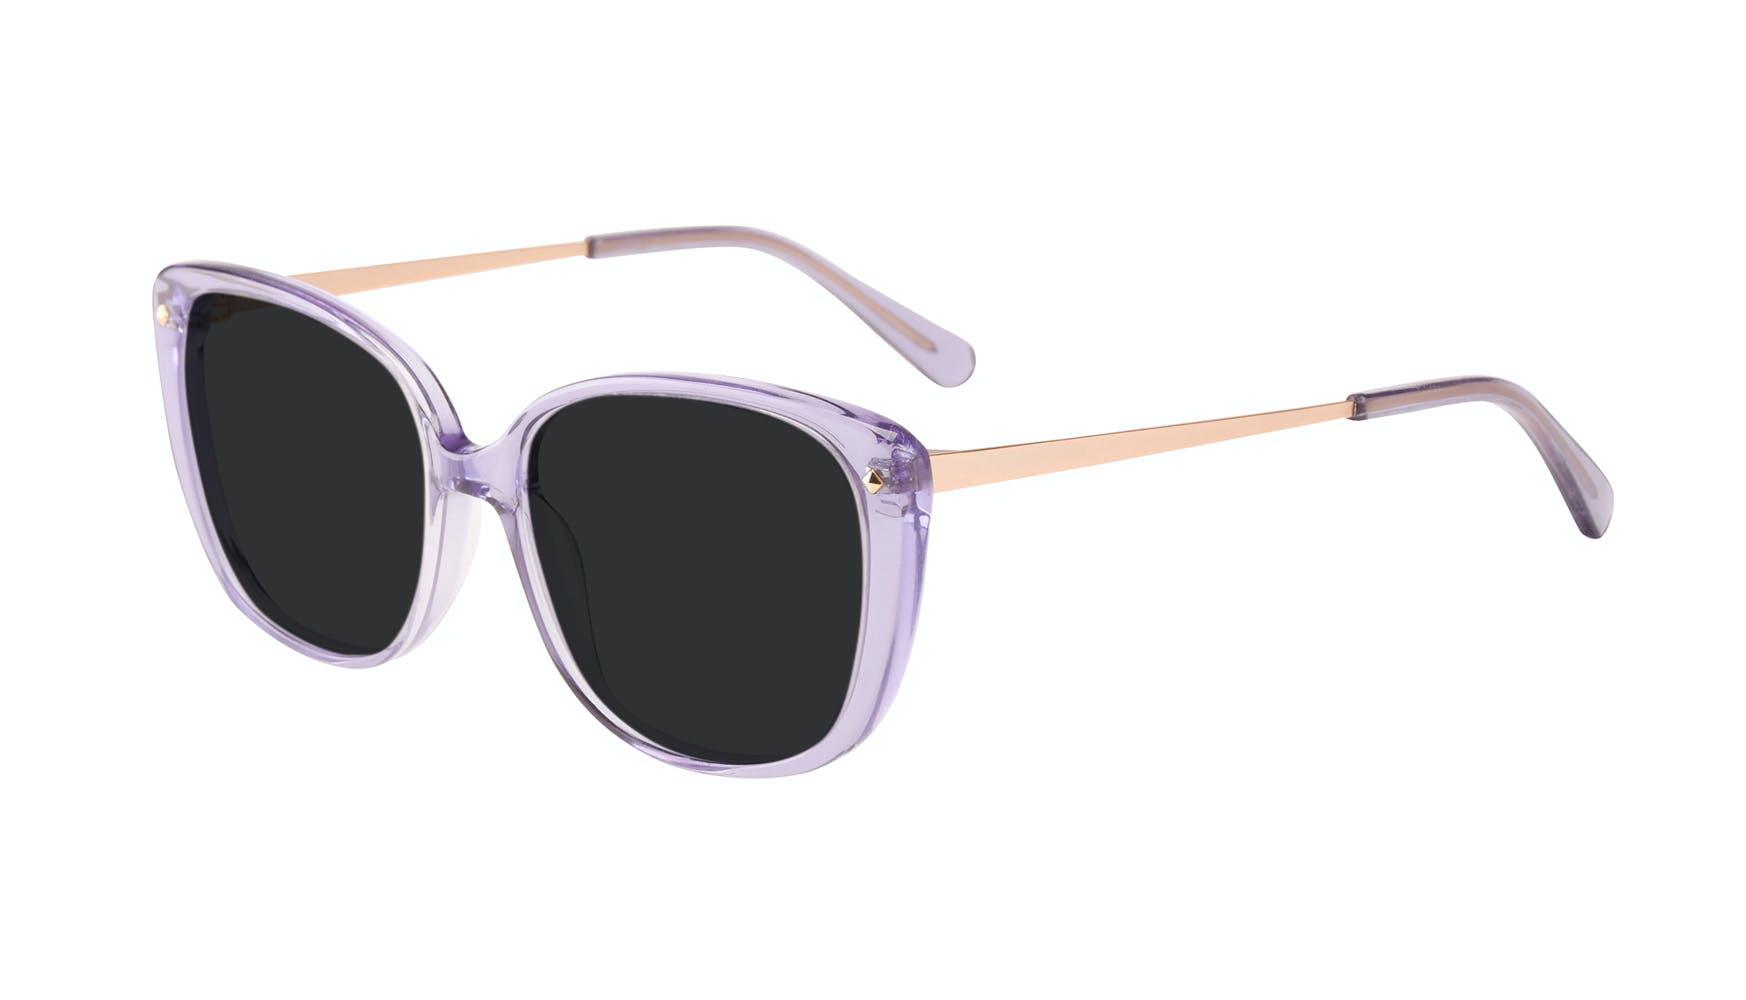 Affordable Fashion Glasses Square Sunglasses Women Japonisme Lavender Tilt